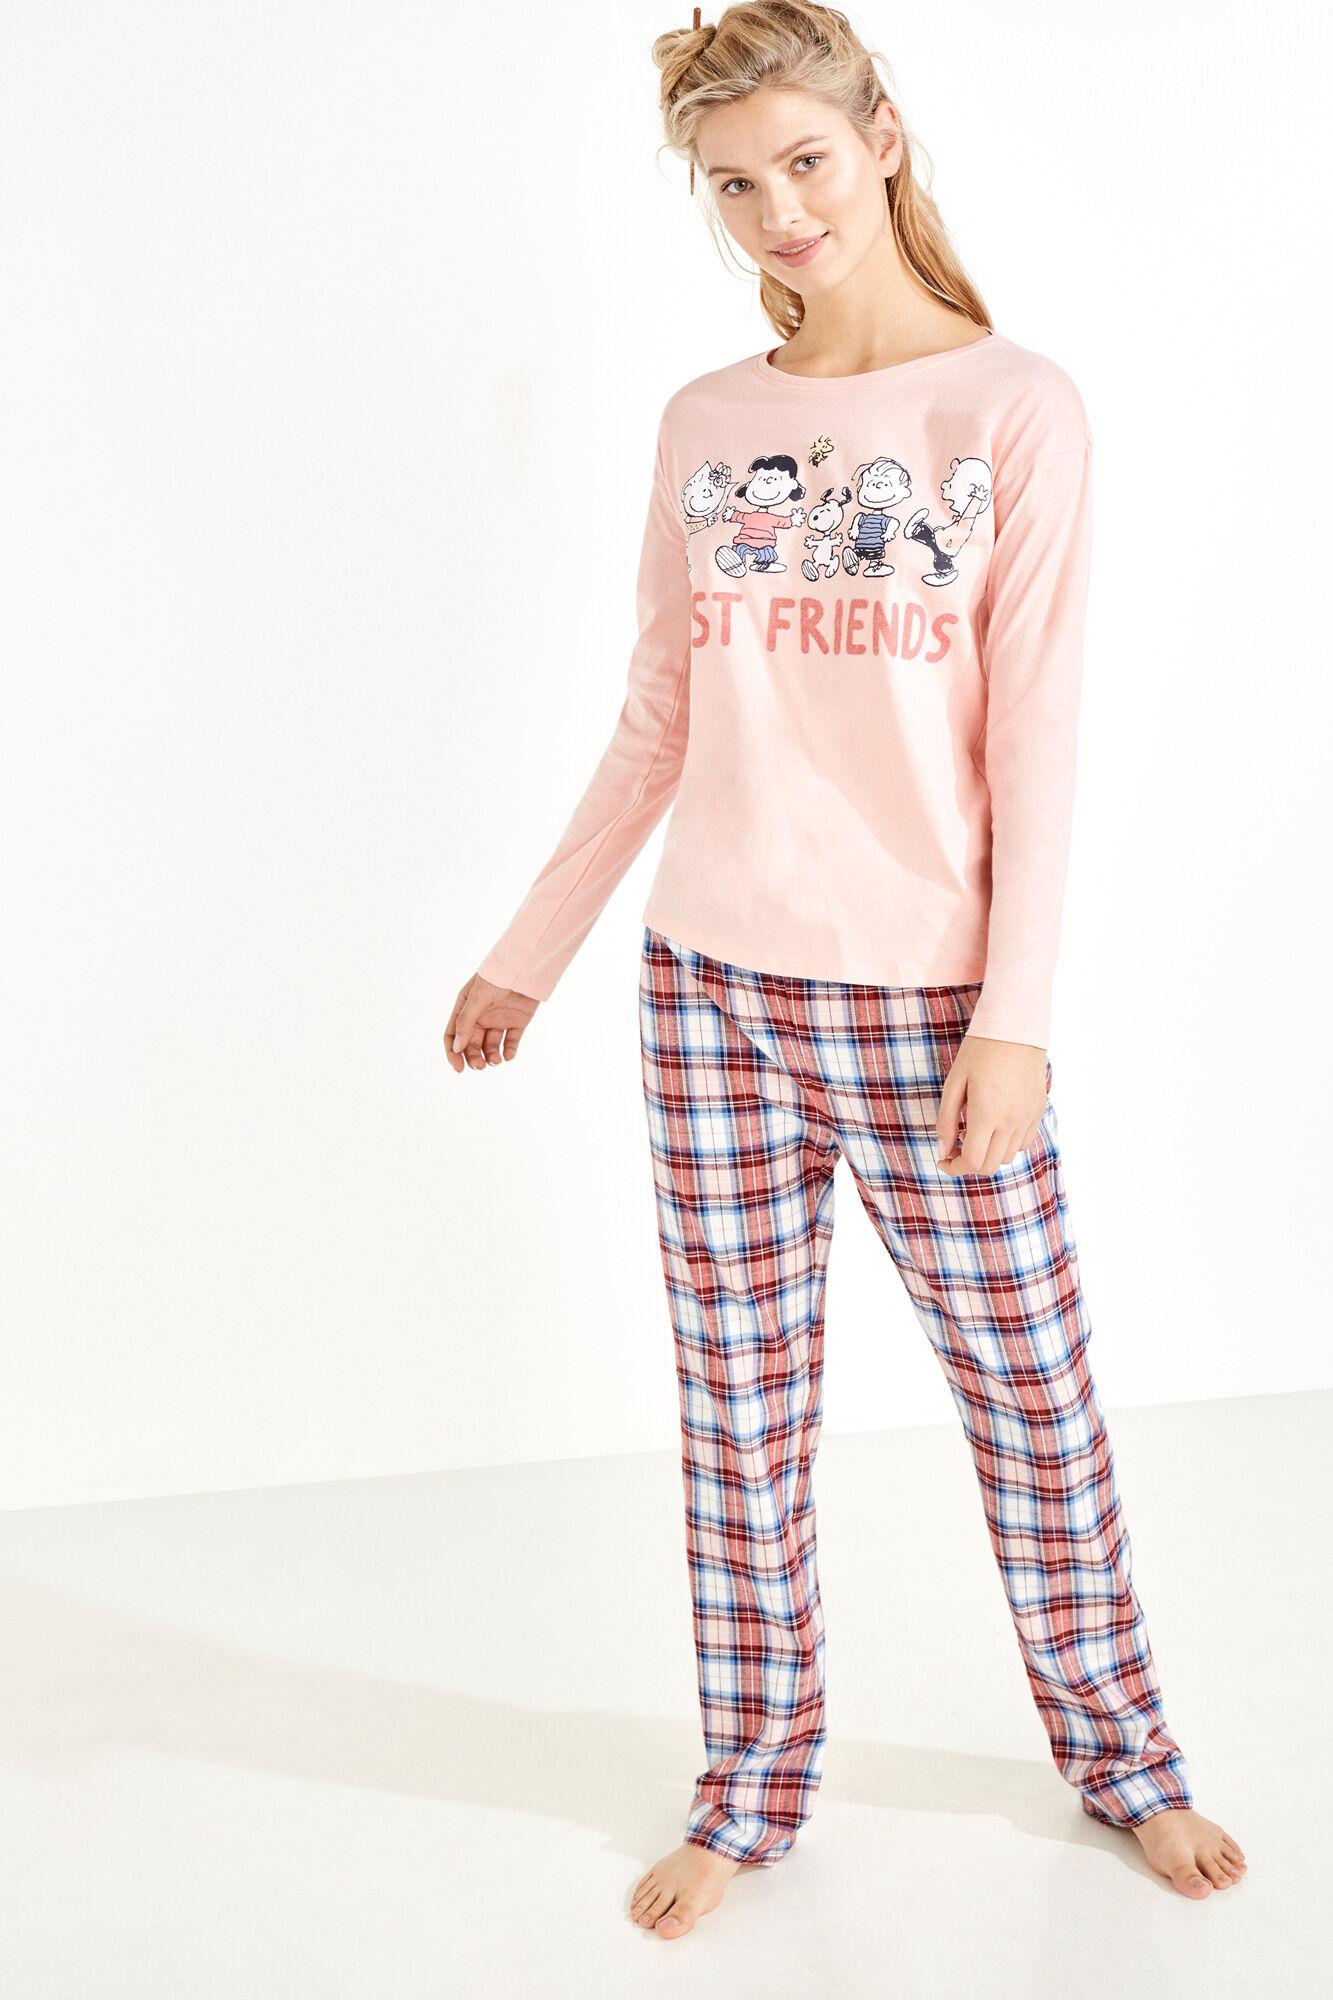 23eac90e29 Peanuts Snoopy cotton pyjamas. Womensecret. Womensecret